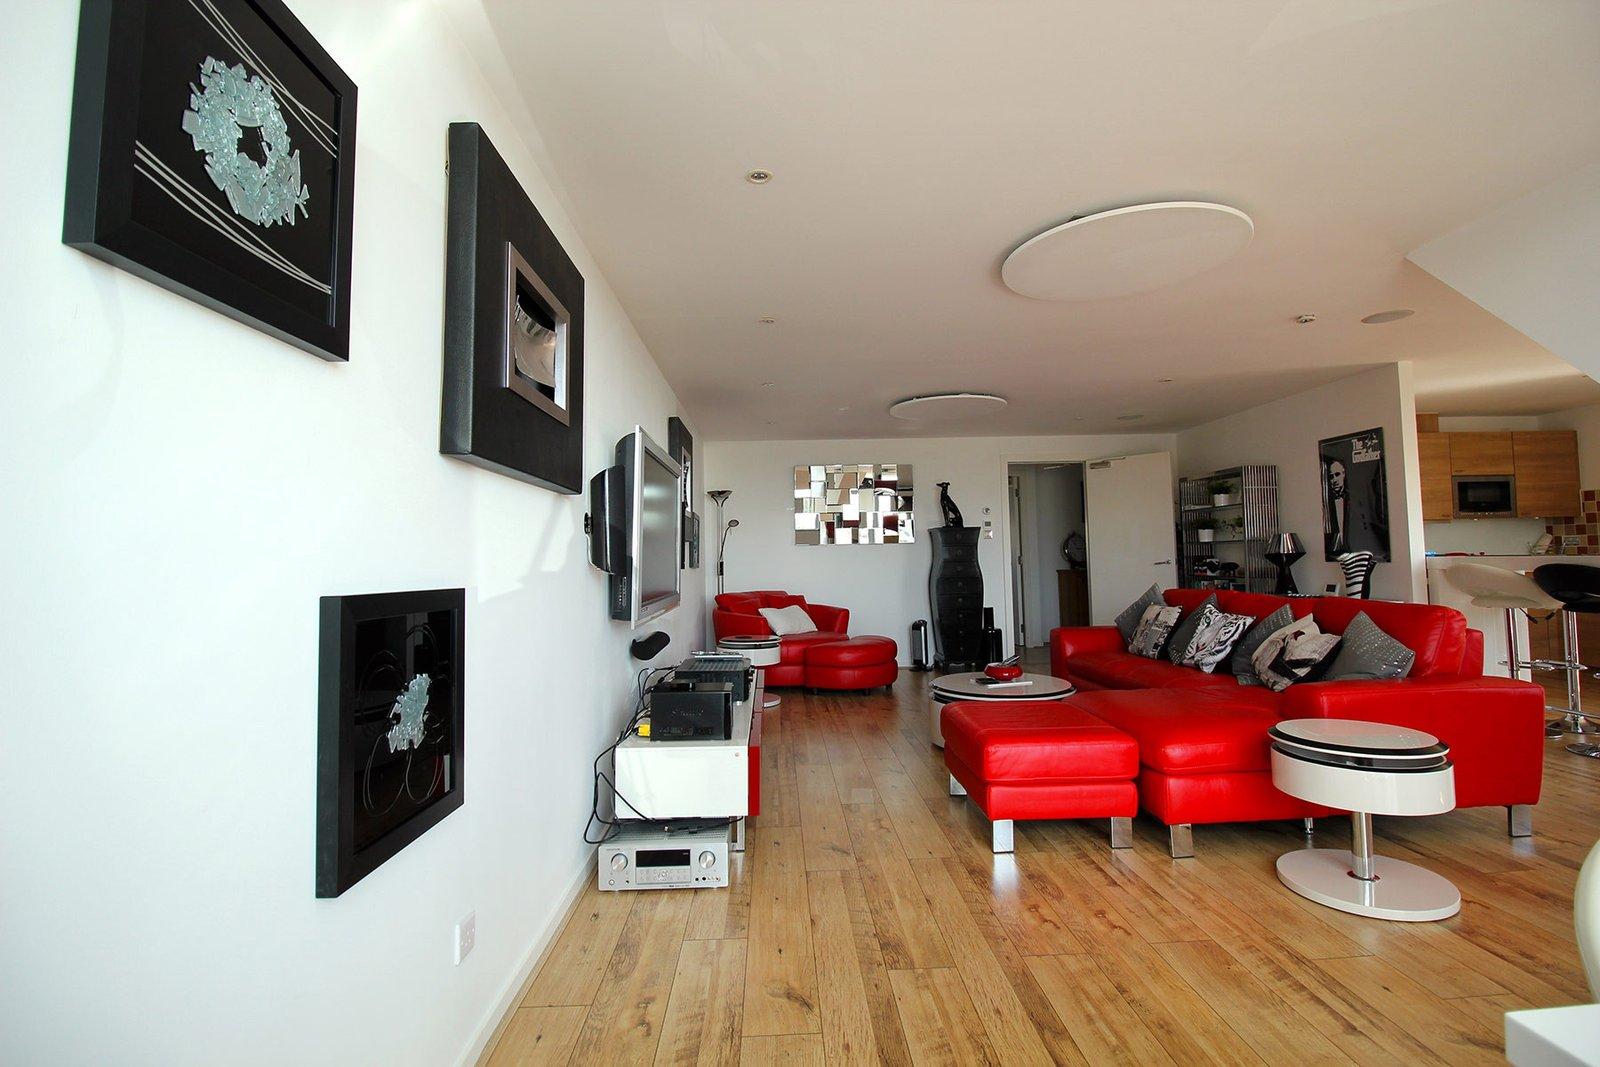 Redwell_Infrared_Heater_ceiling_Round4_1600x1600